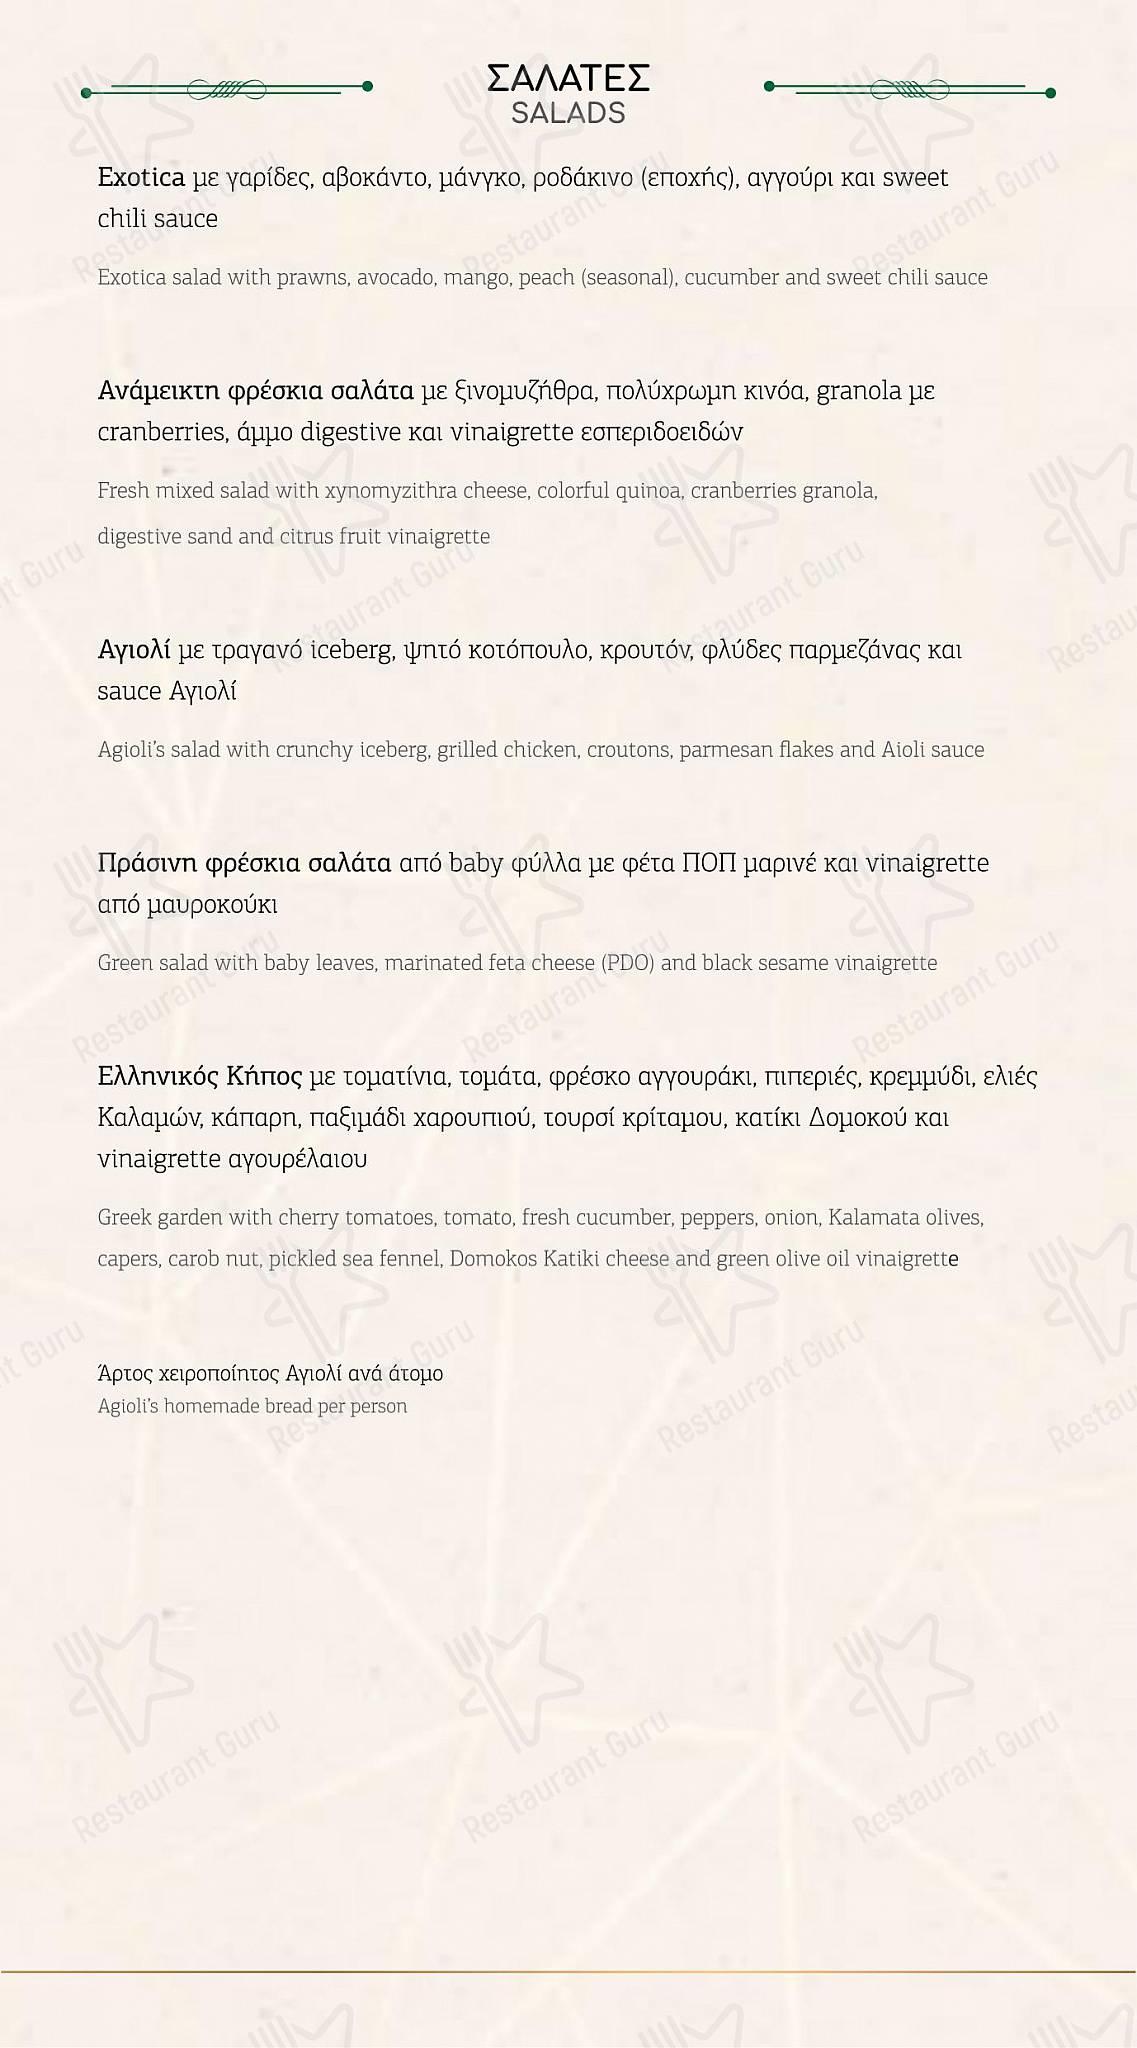 Menu for the Αγιολί restaurant